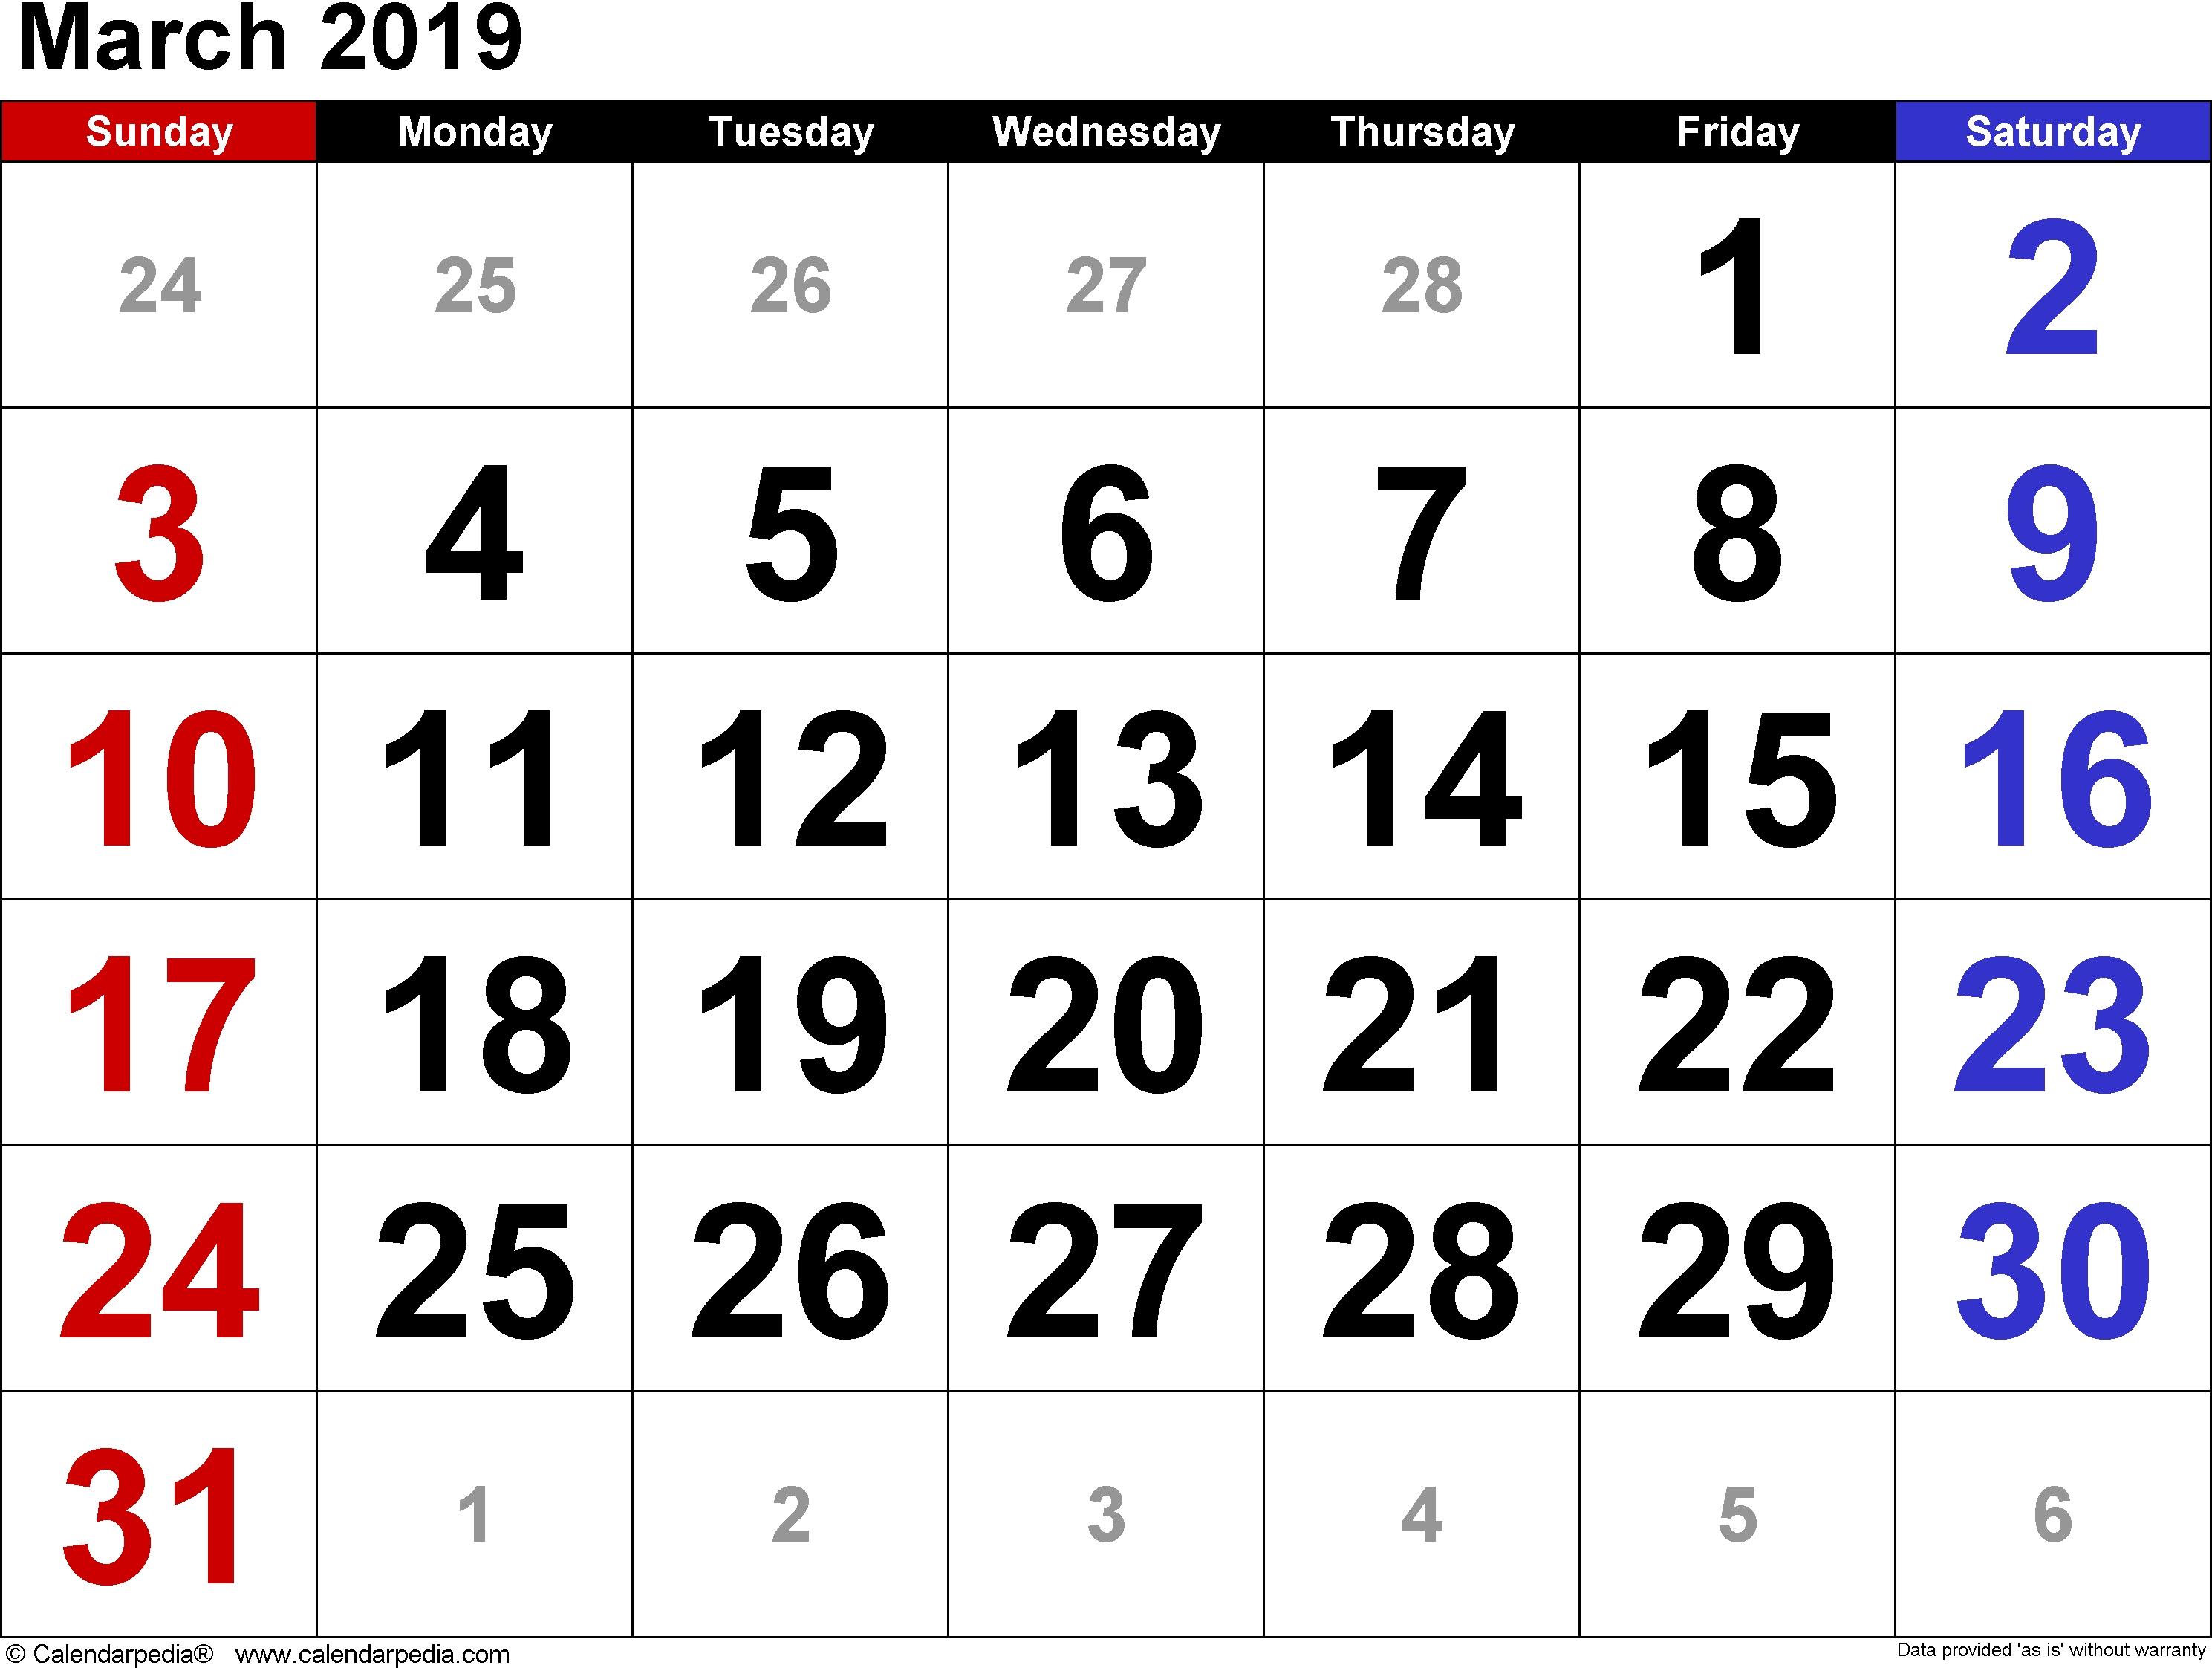 Get Free Template March 2019 A4 Calendar - Free Calendar And Holidays March 9 2019 Calendar